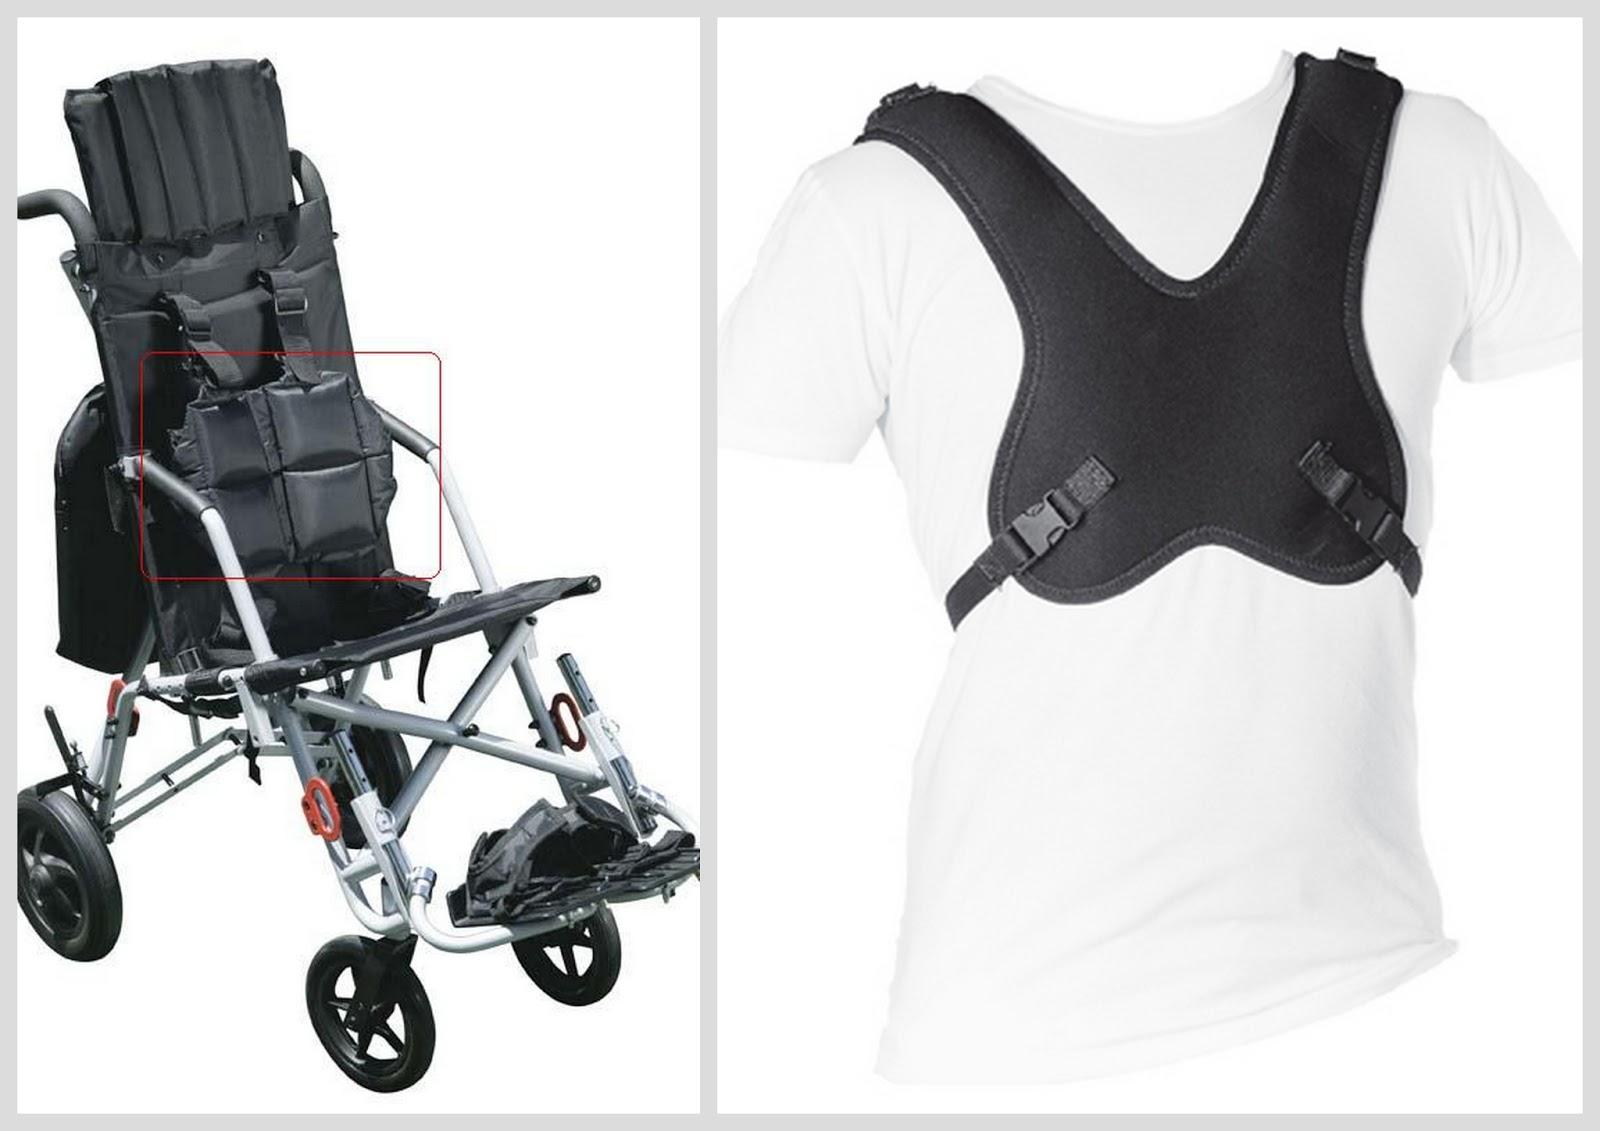 Wheelchair Harness Clip On High Chair Nz Care Craft Fixatievest